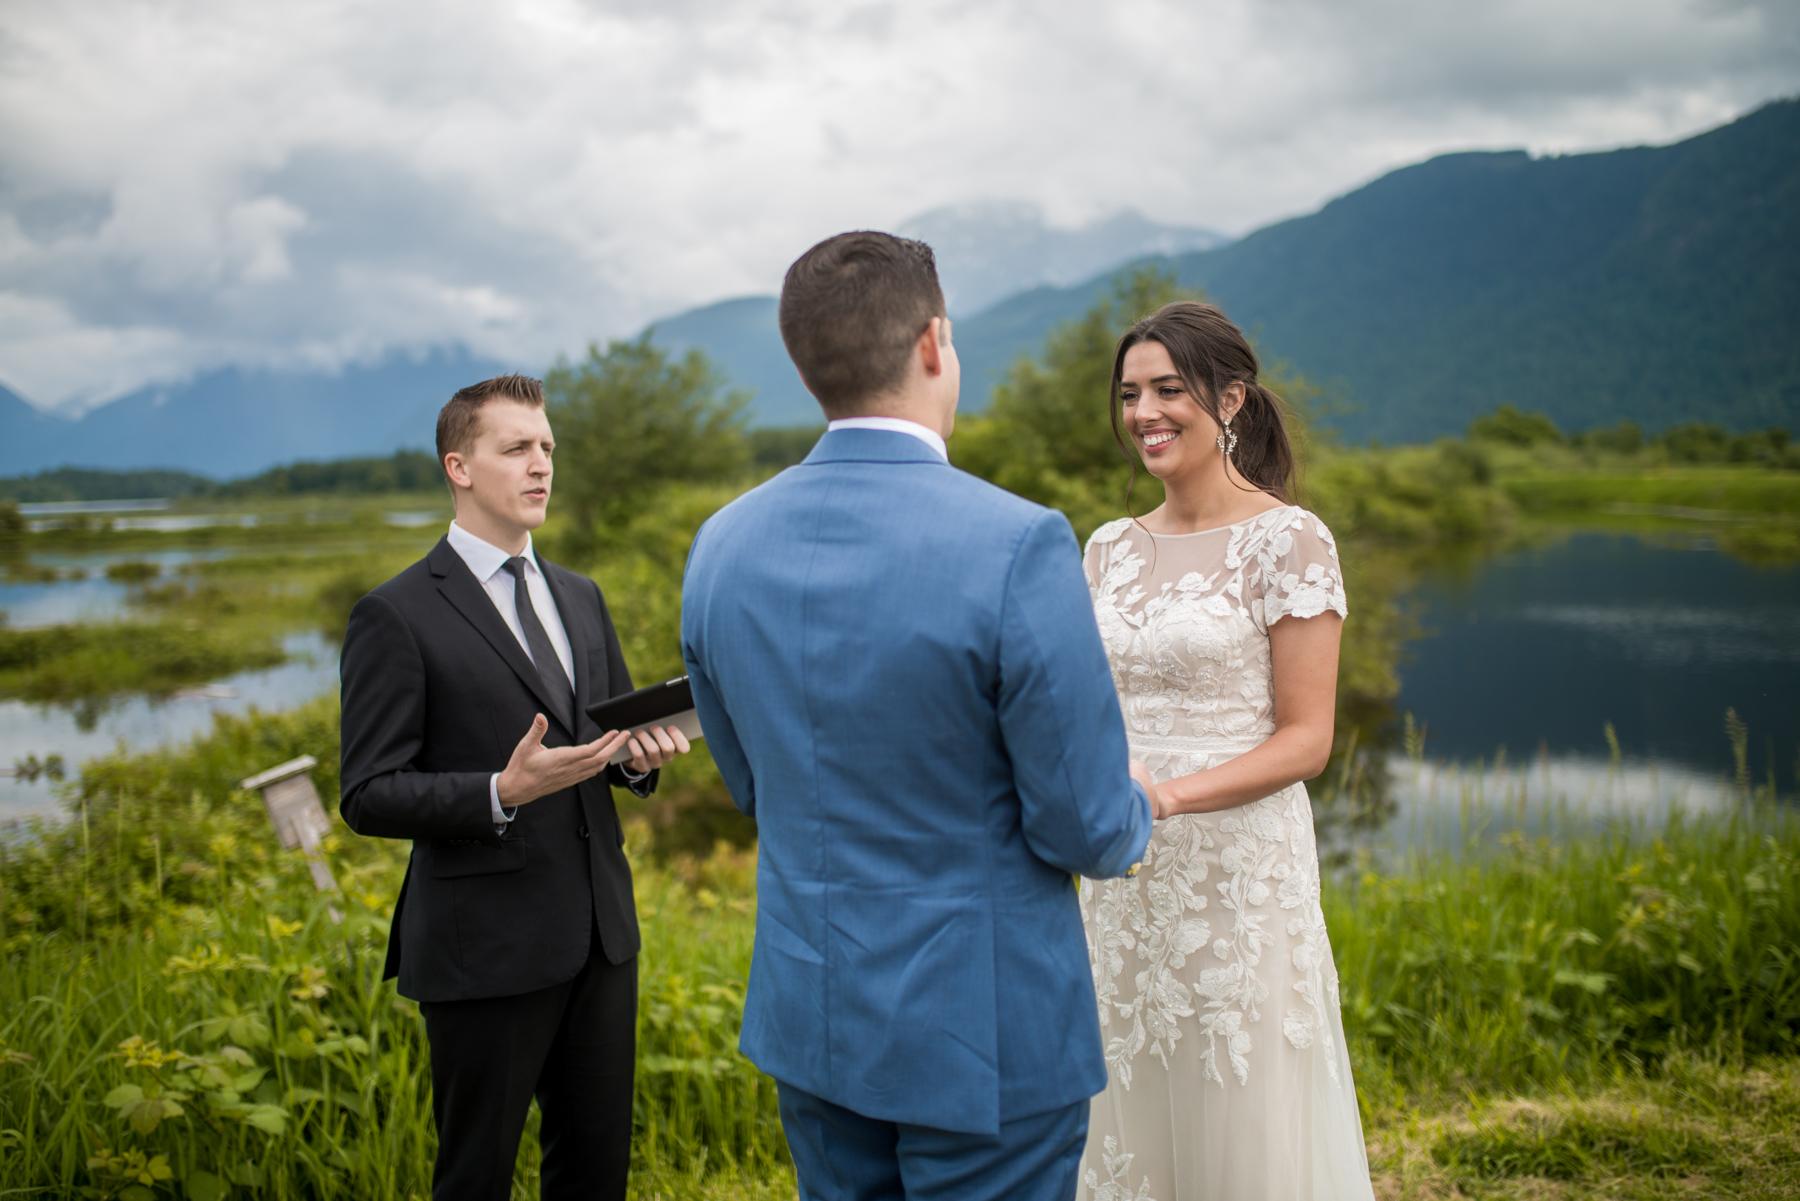 dp-wedding-web-064